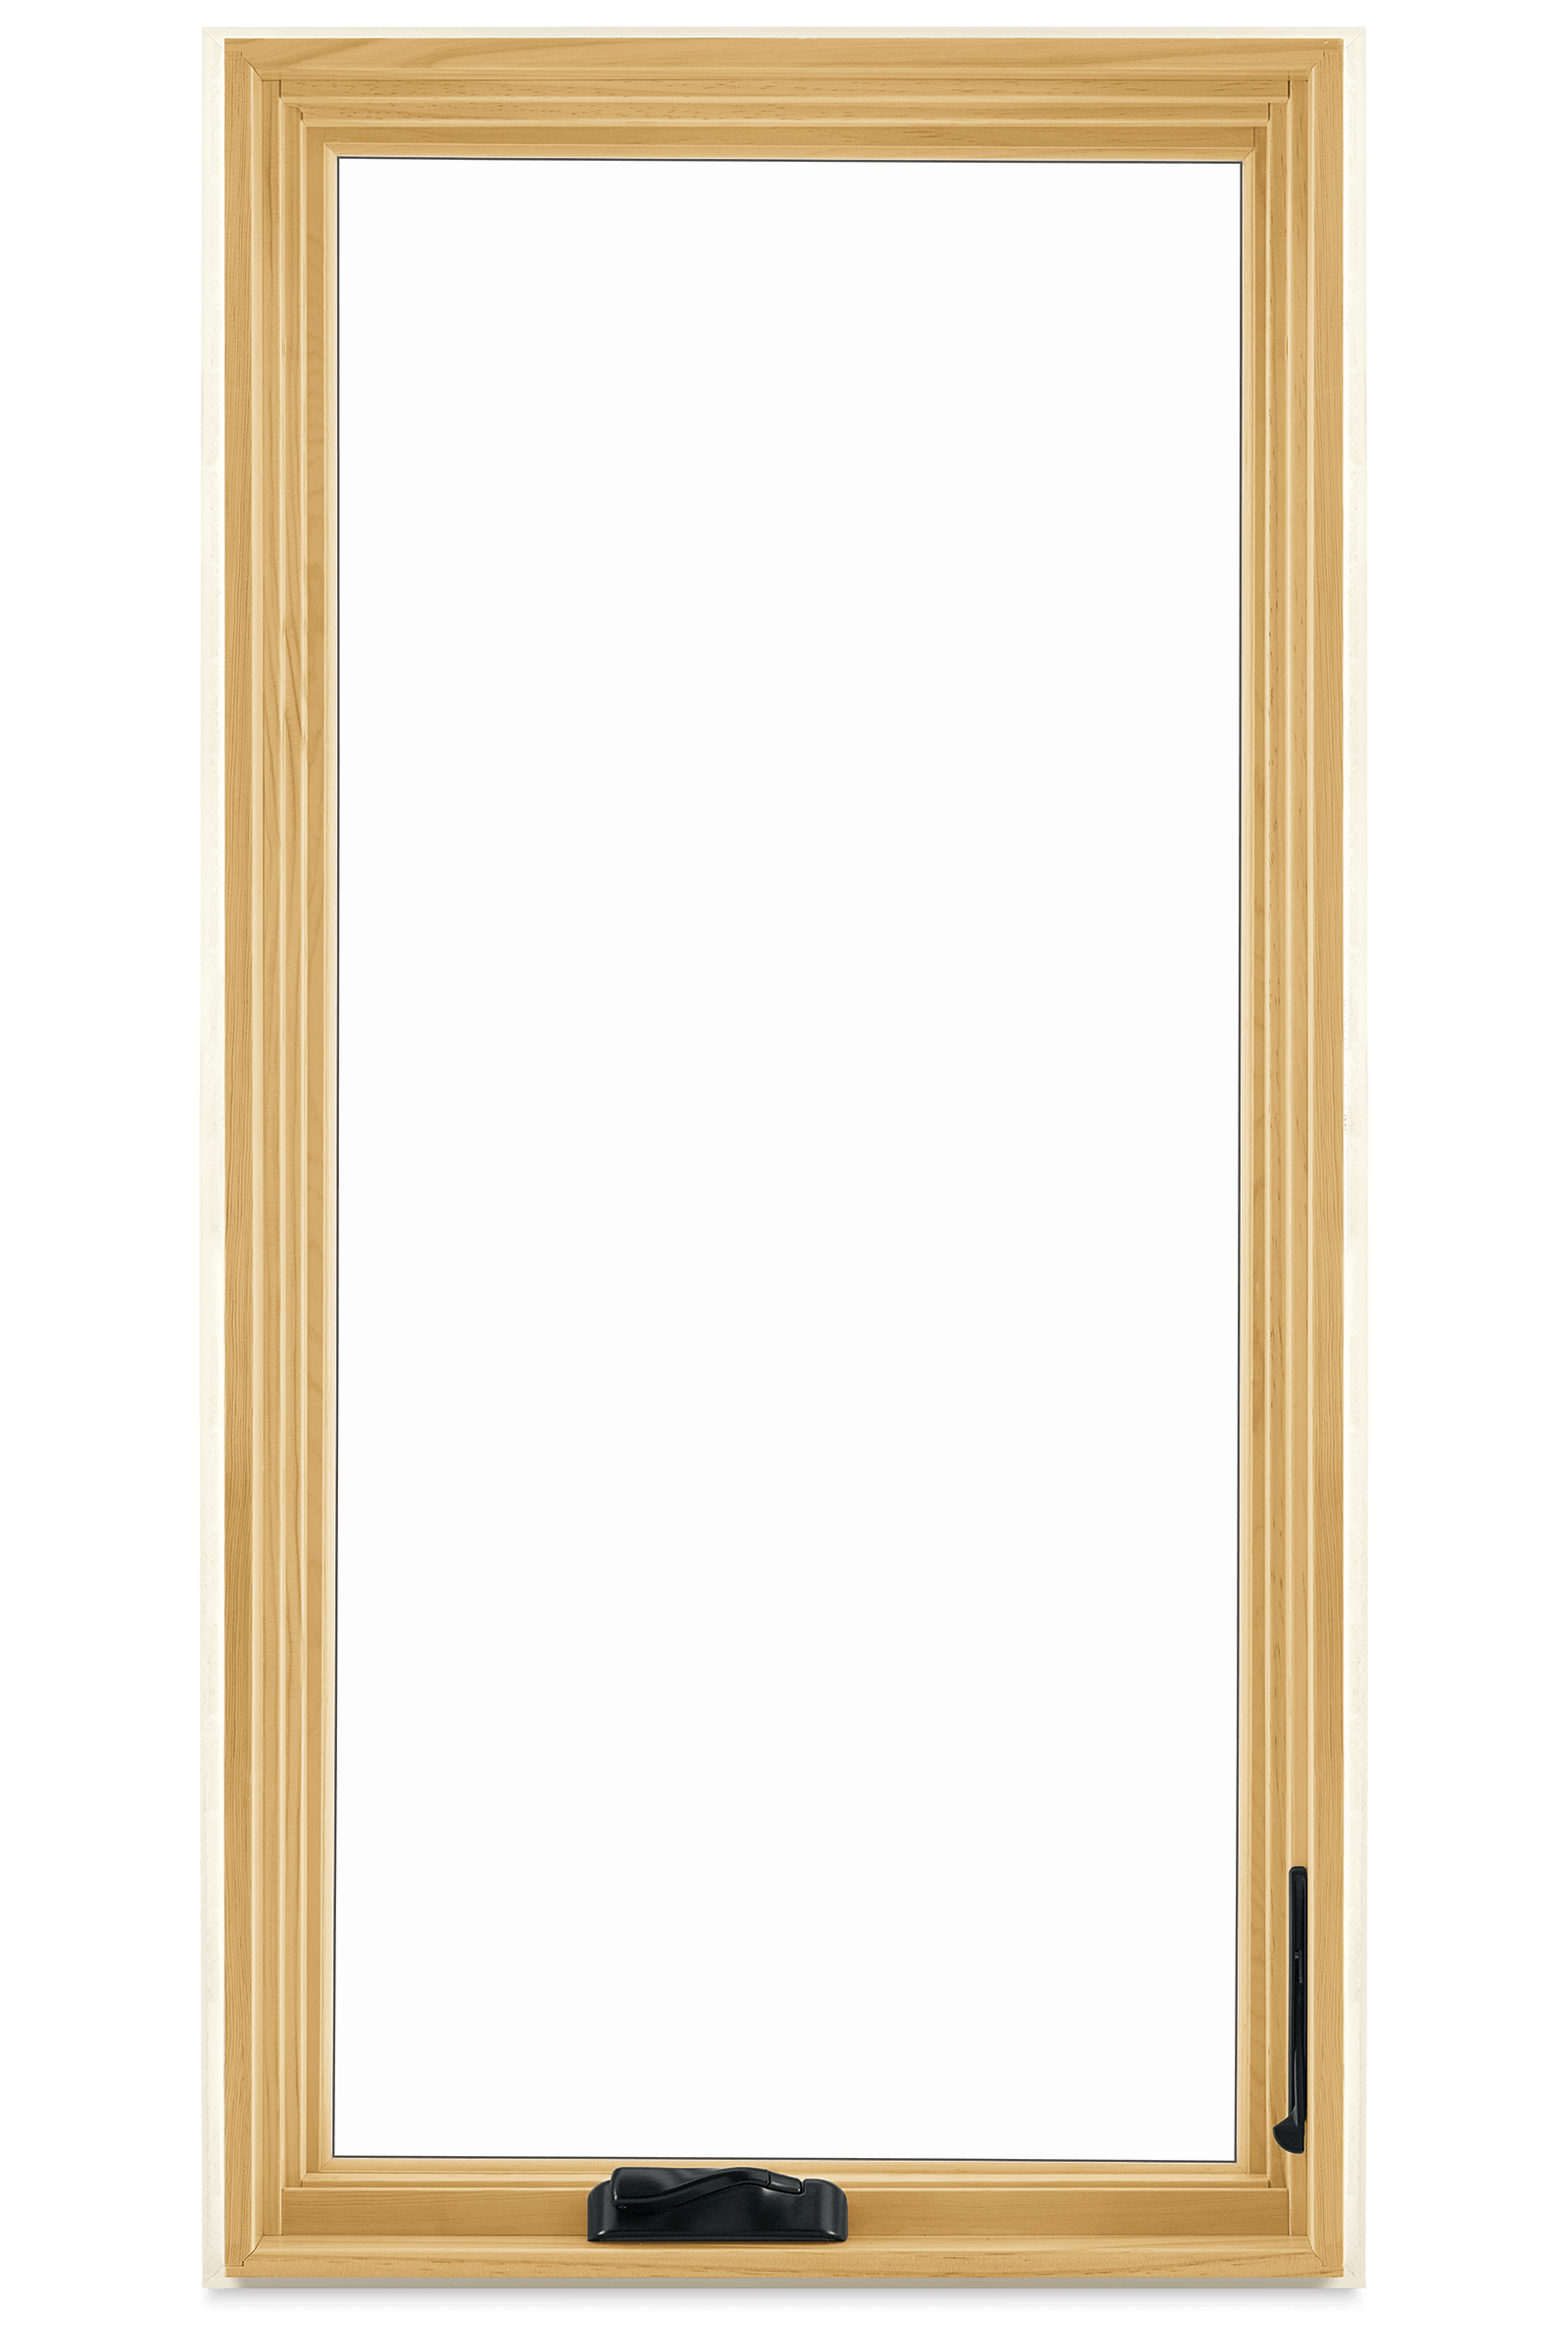 Wood Fiberglass Casement Windows Elevate Casement Marvin